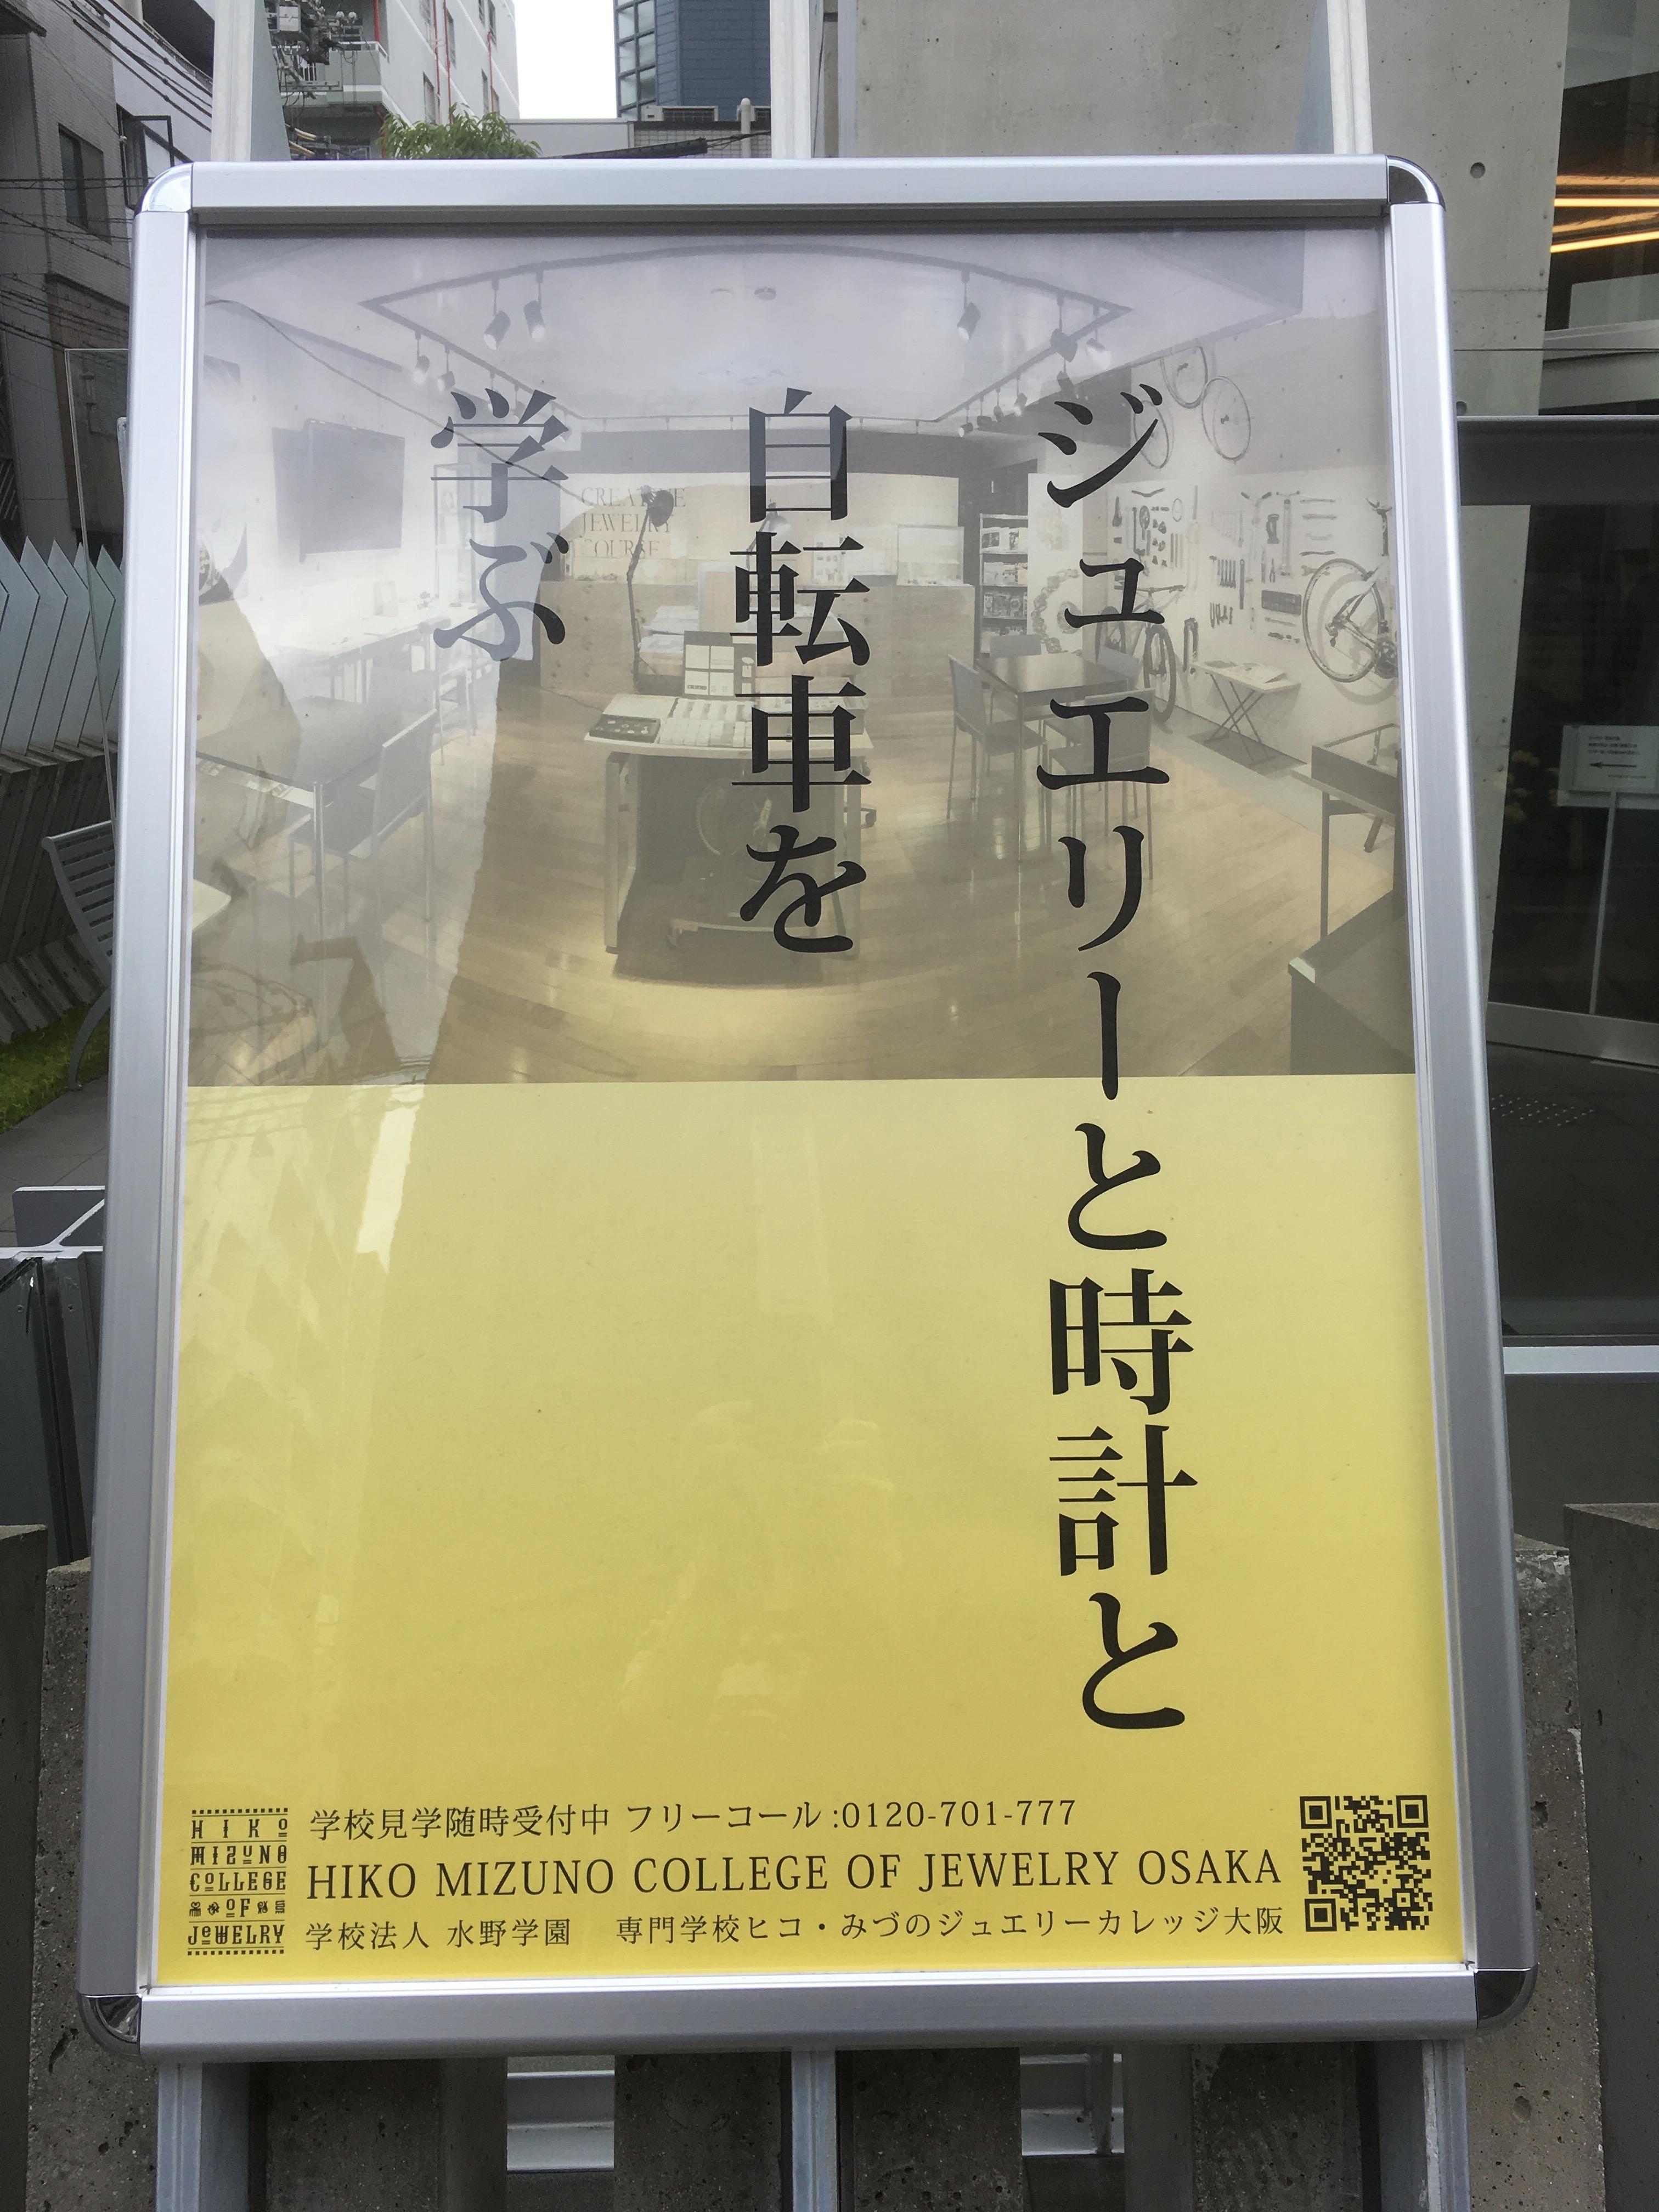 Hiko Mizuno College of Jewelry, Osaka, 2019. Foto Beppe Kessler